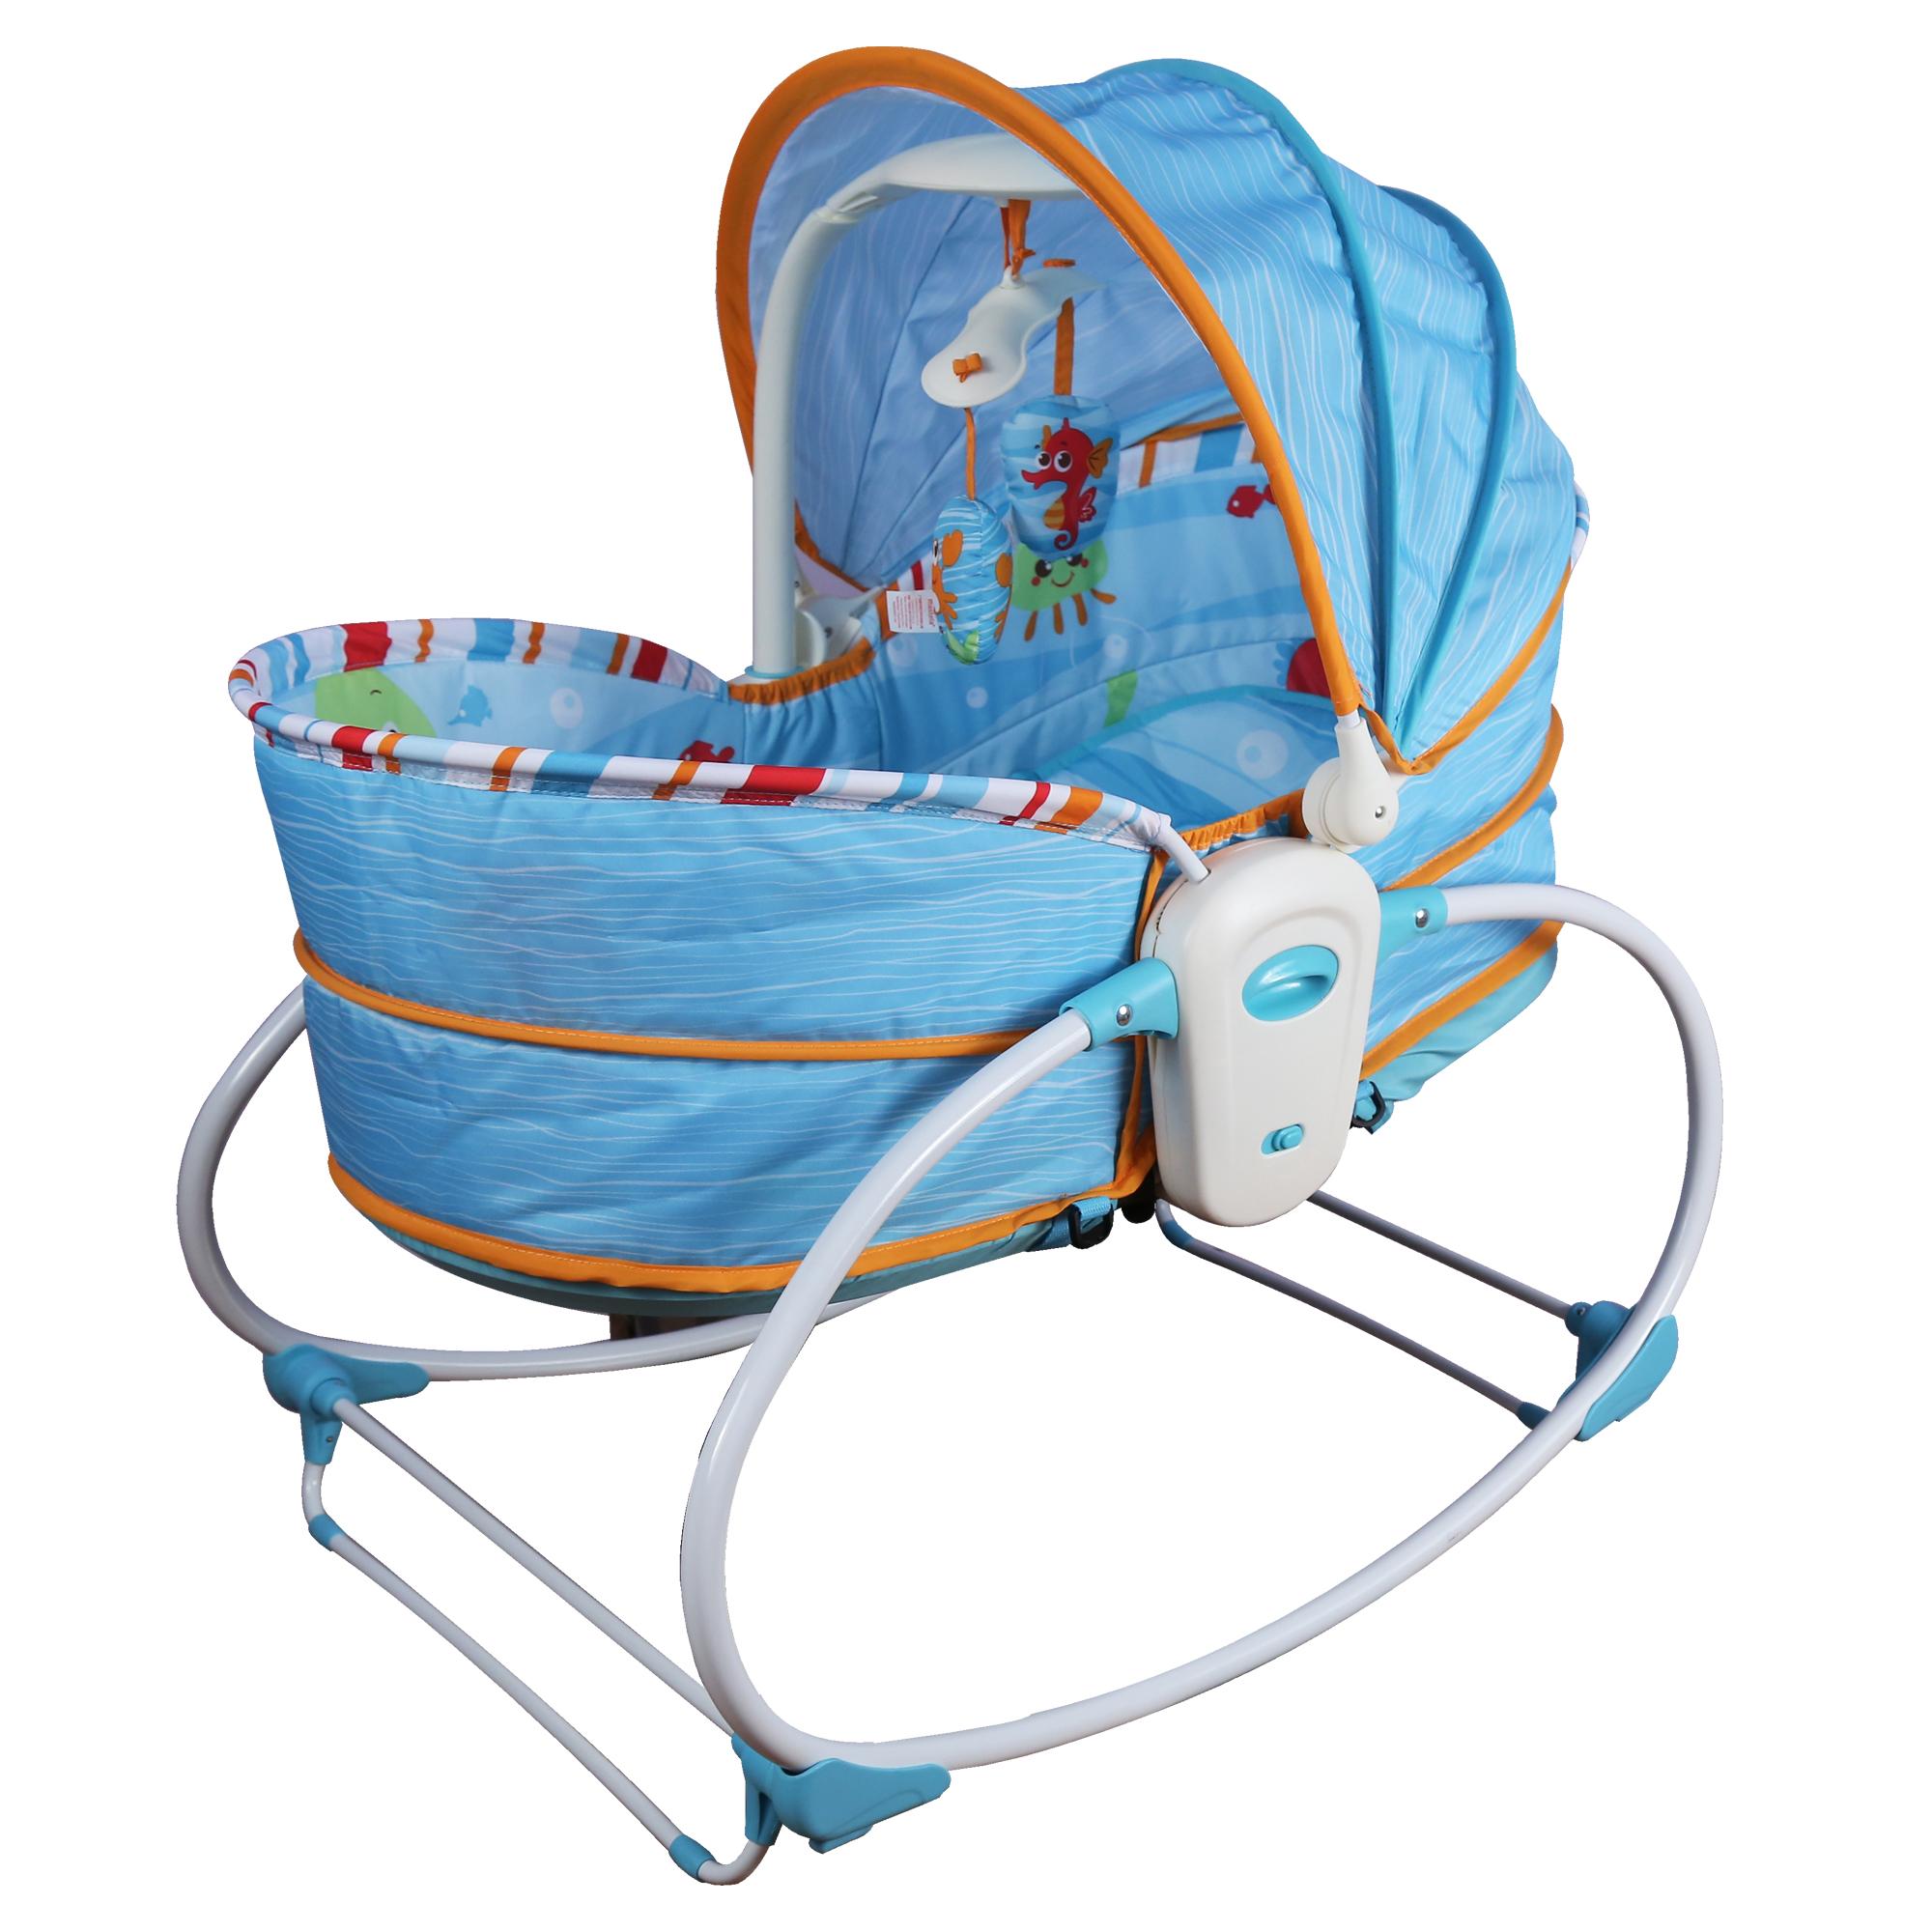 Mothercare | Mastela 5 In 1 Baby Rocker